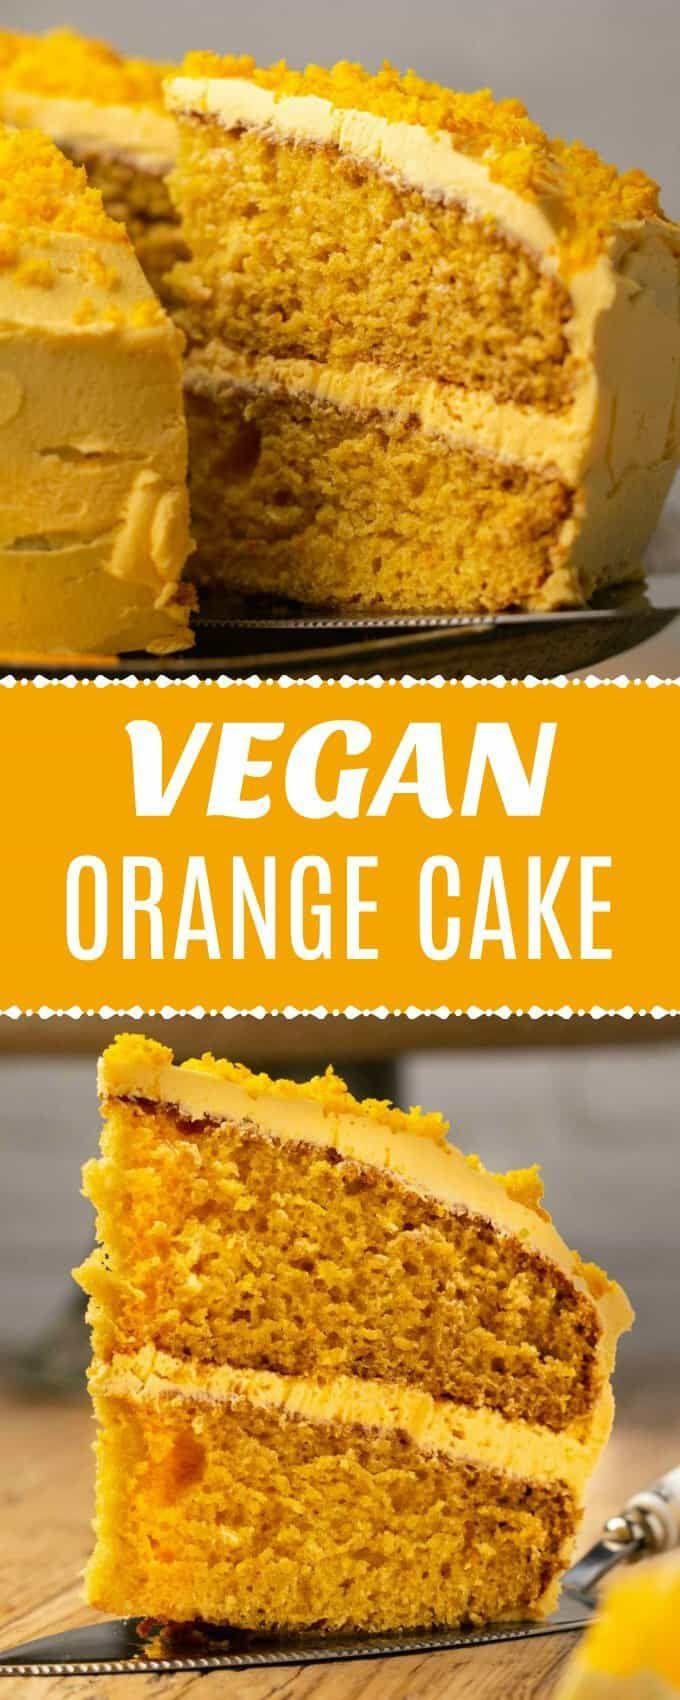 The best vegan orange cake with heaps of orange flavor and a gorgeous color. Lig...,  The best vegan orange cake with heaps of orange flavor and a gorgeous color. Lig...,